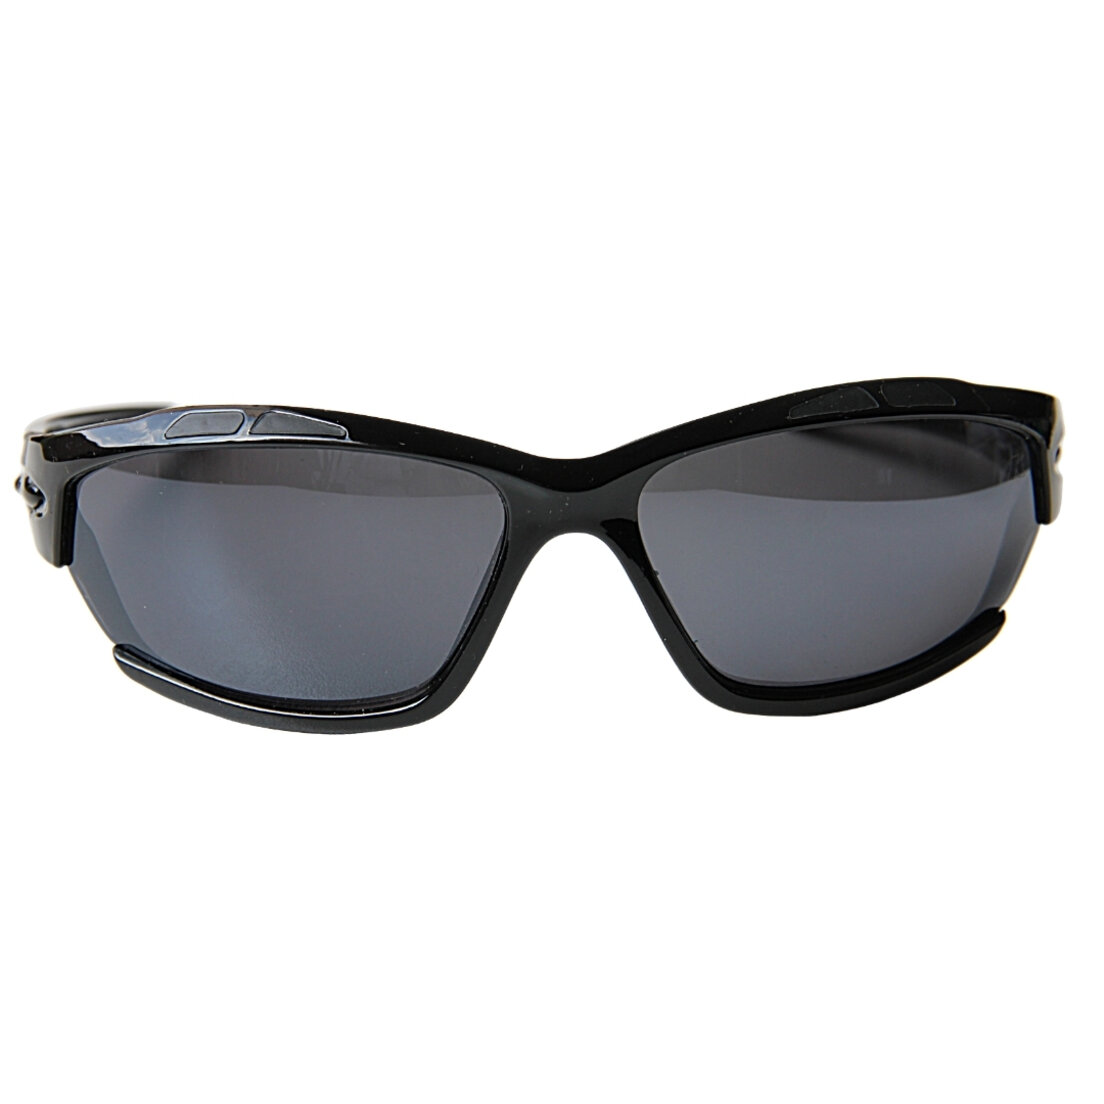 OUTLET - Óculos de Sol Khatto Esportivo Scott